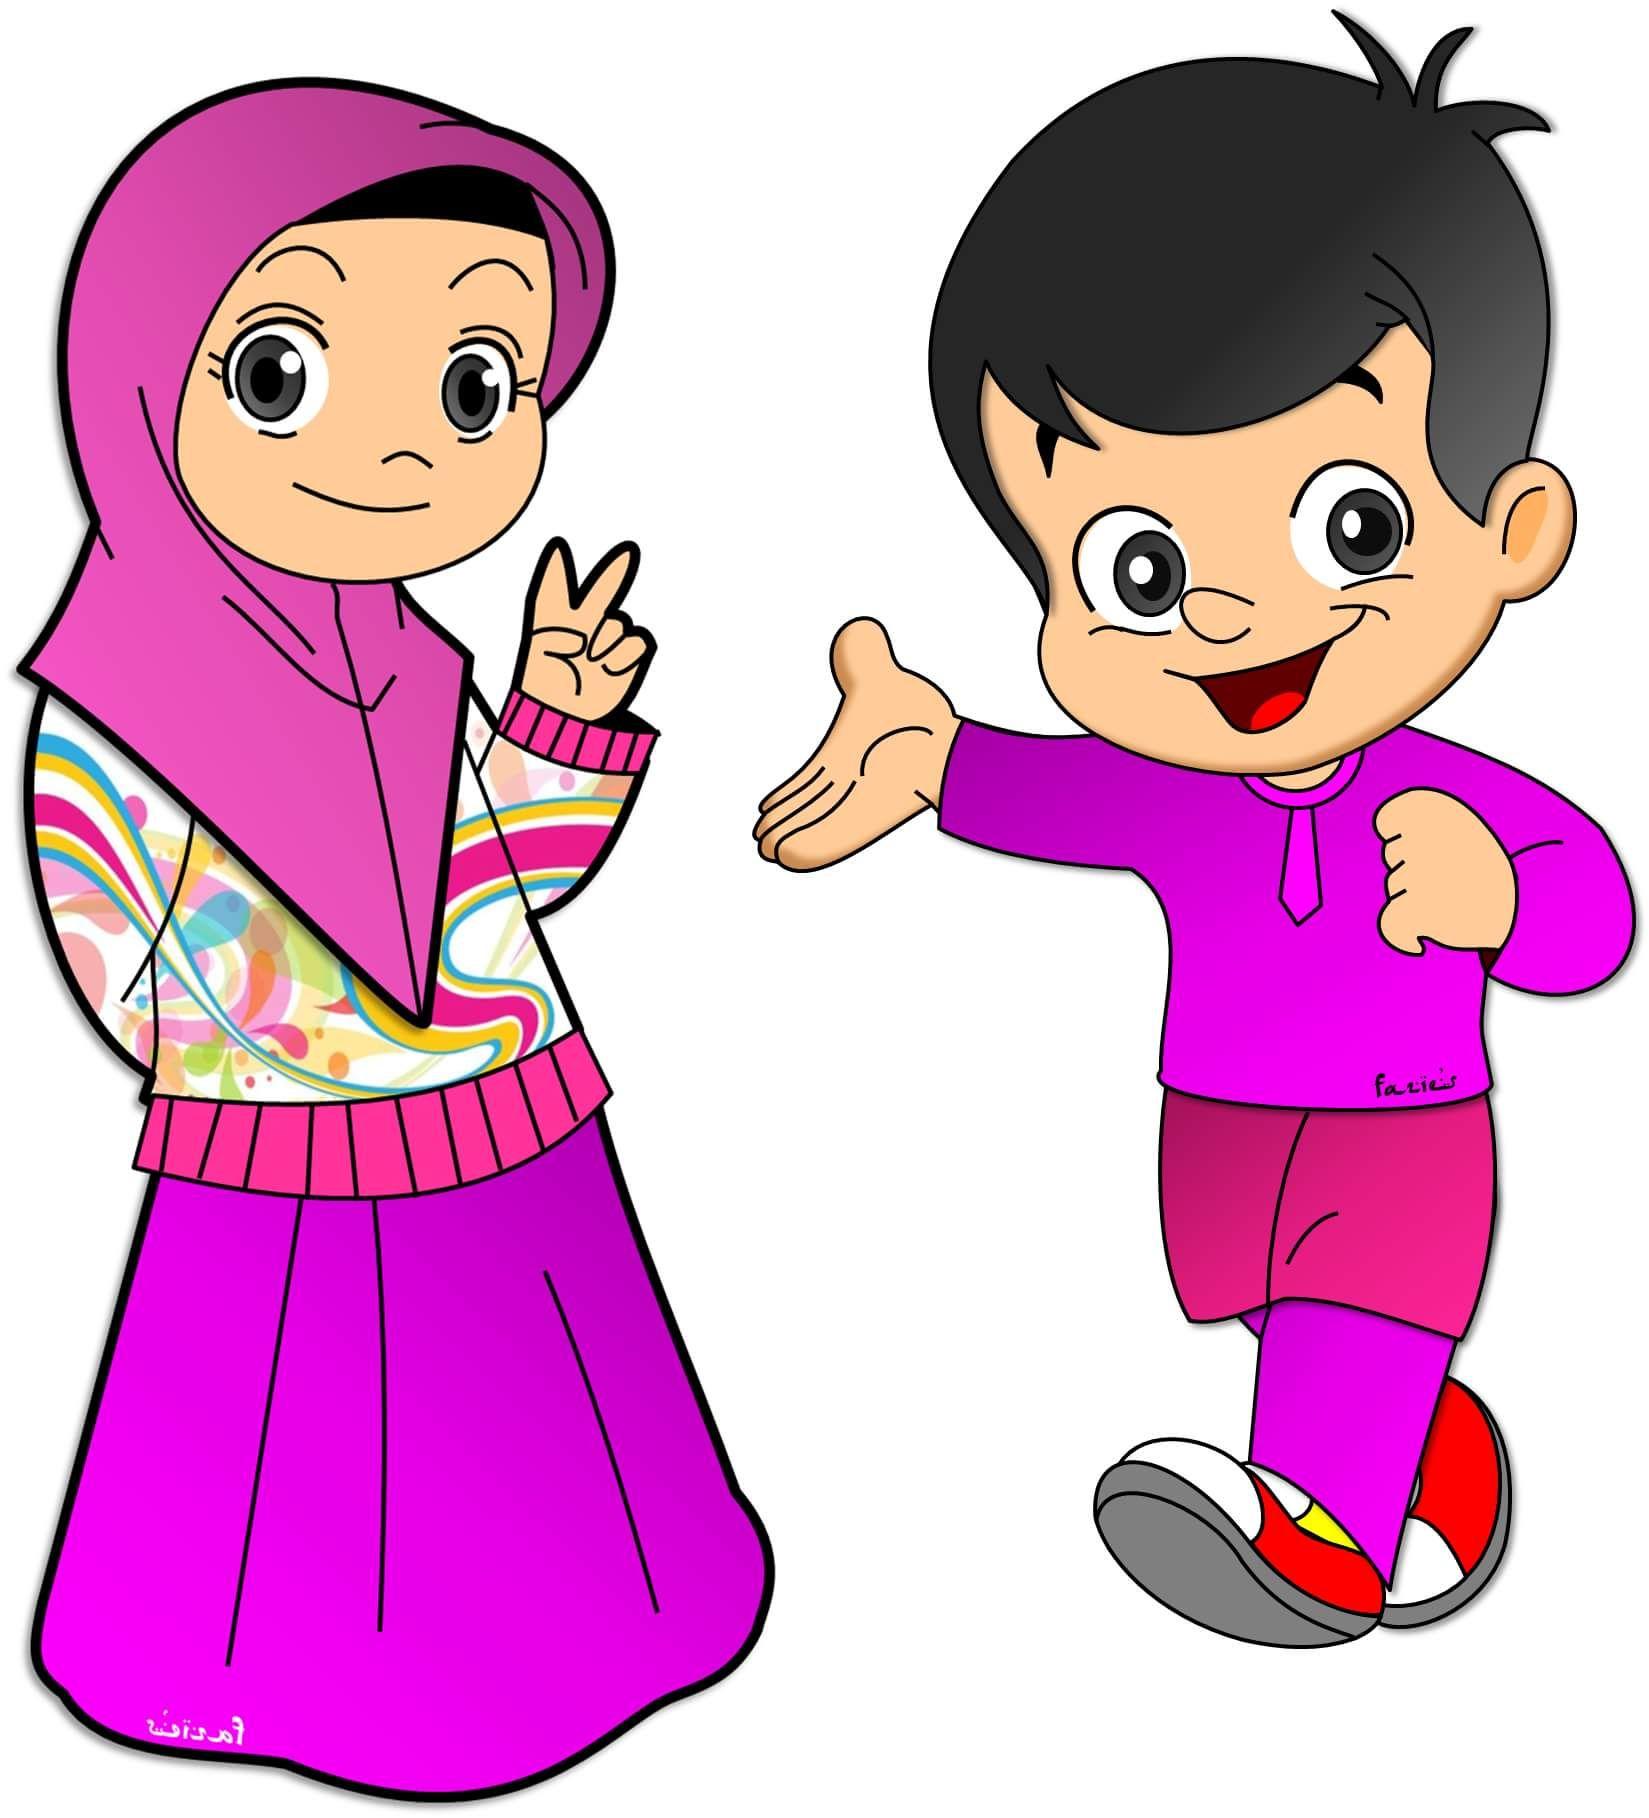 Kartun, Anak, Animasi